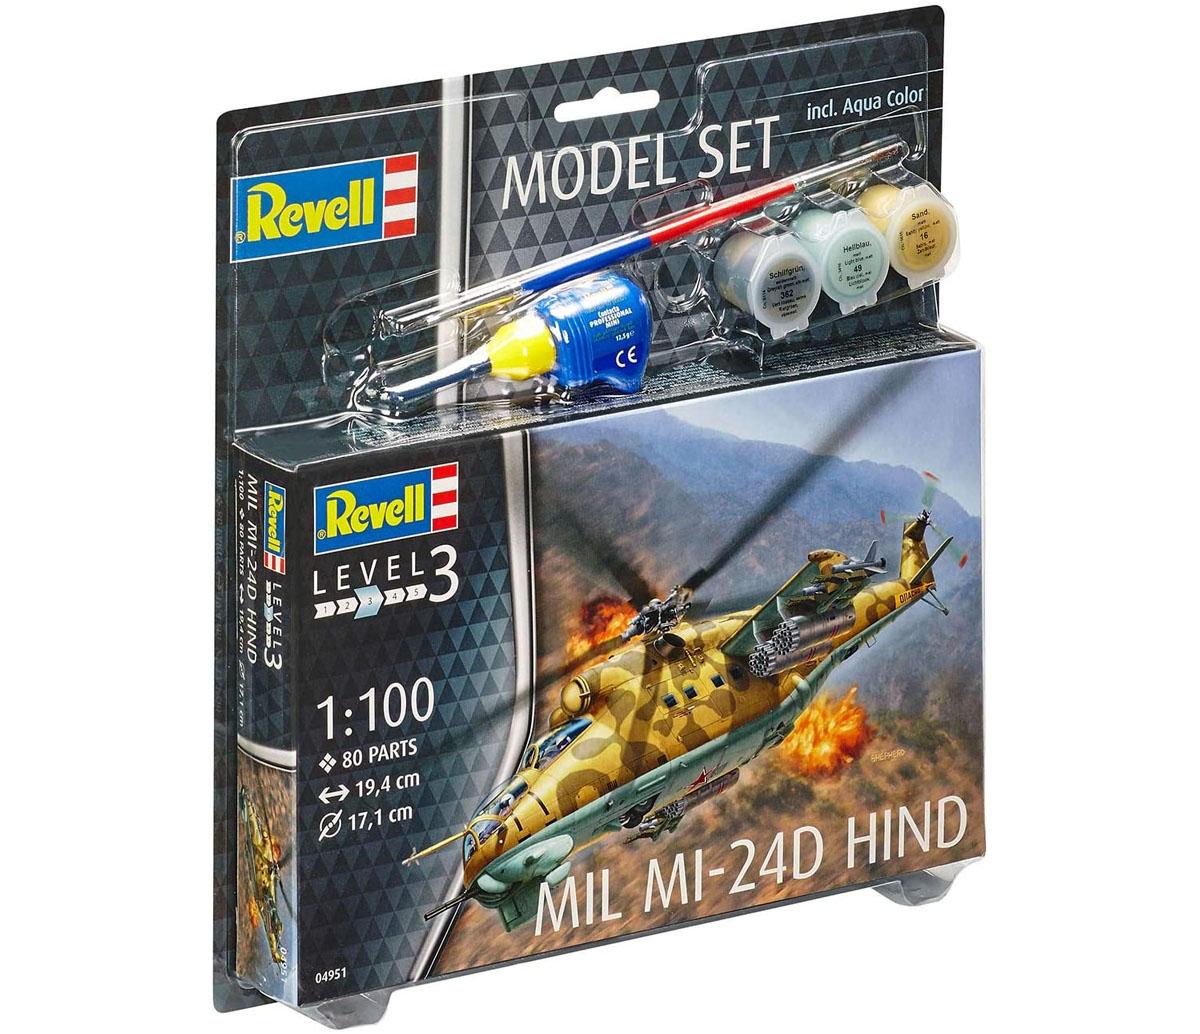 Model Set Mil Mi-24D Hind - 1/100 - Revell 64951  - BLIMPS COMÉRCIO ELETRÔNICO